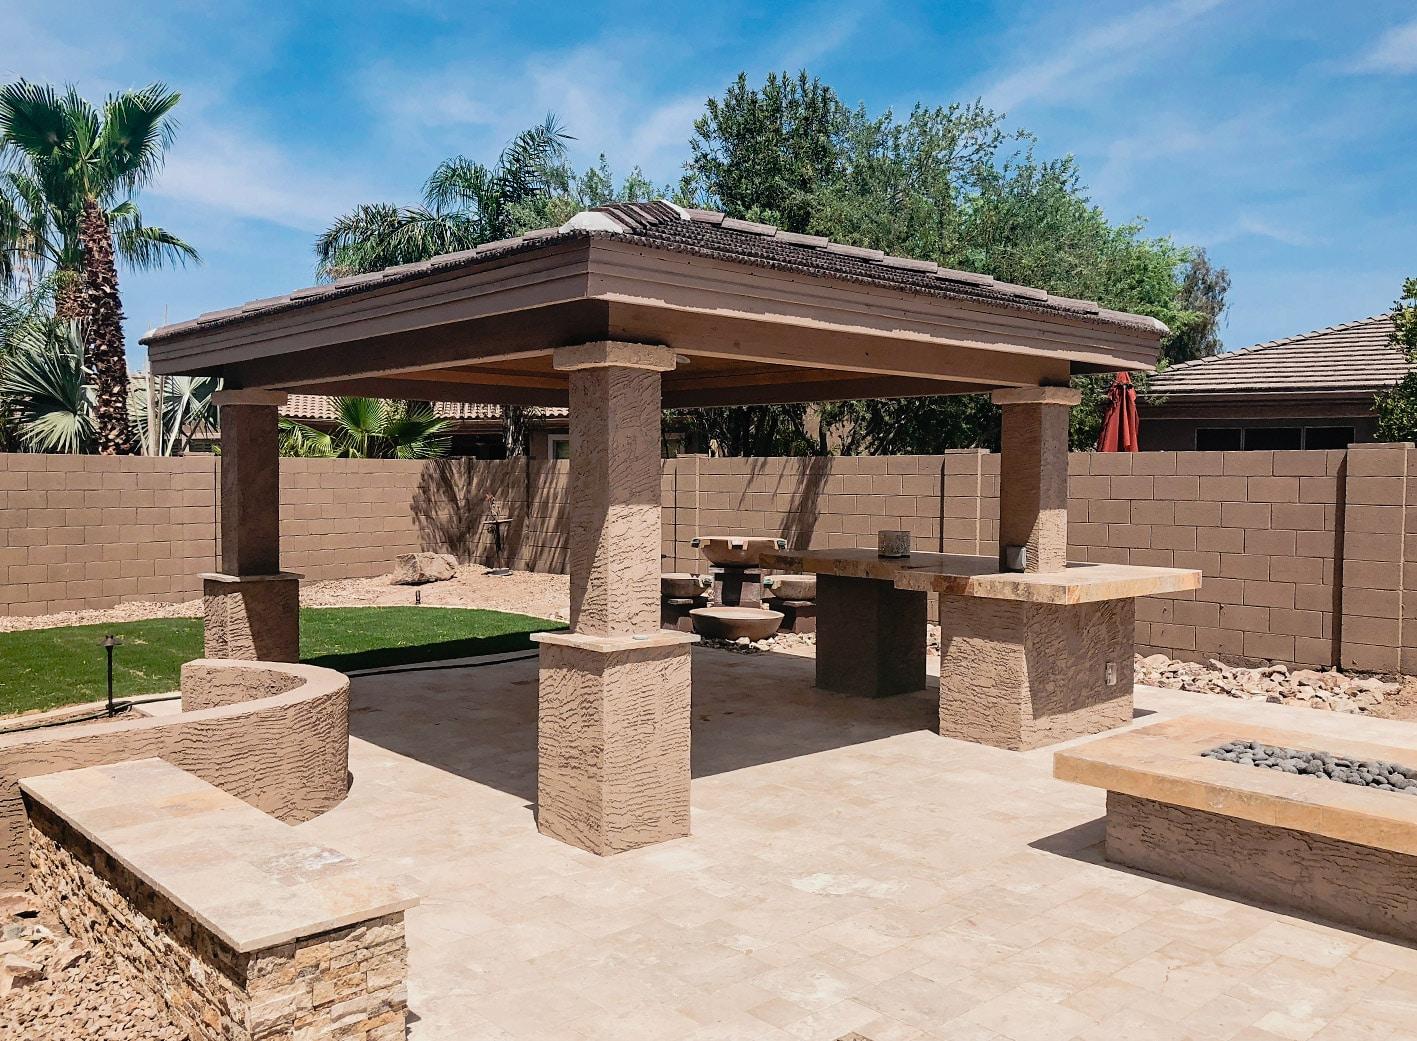 Residential Mesa AZ Landscape Designing